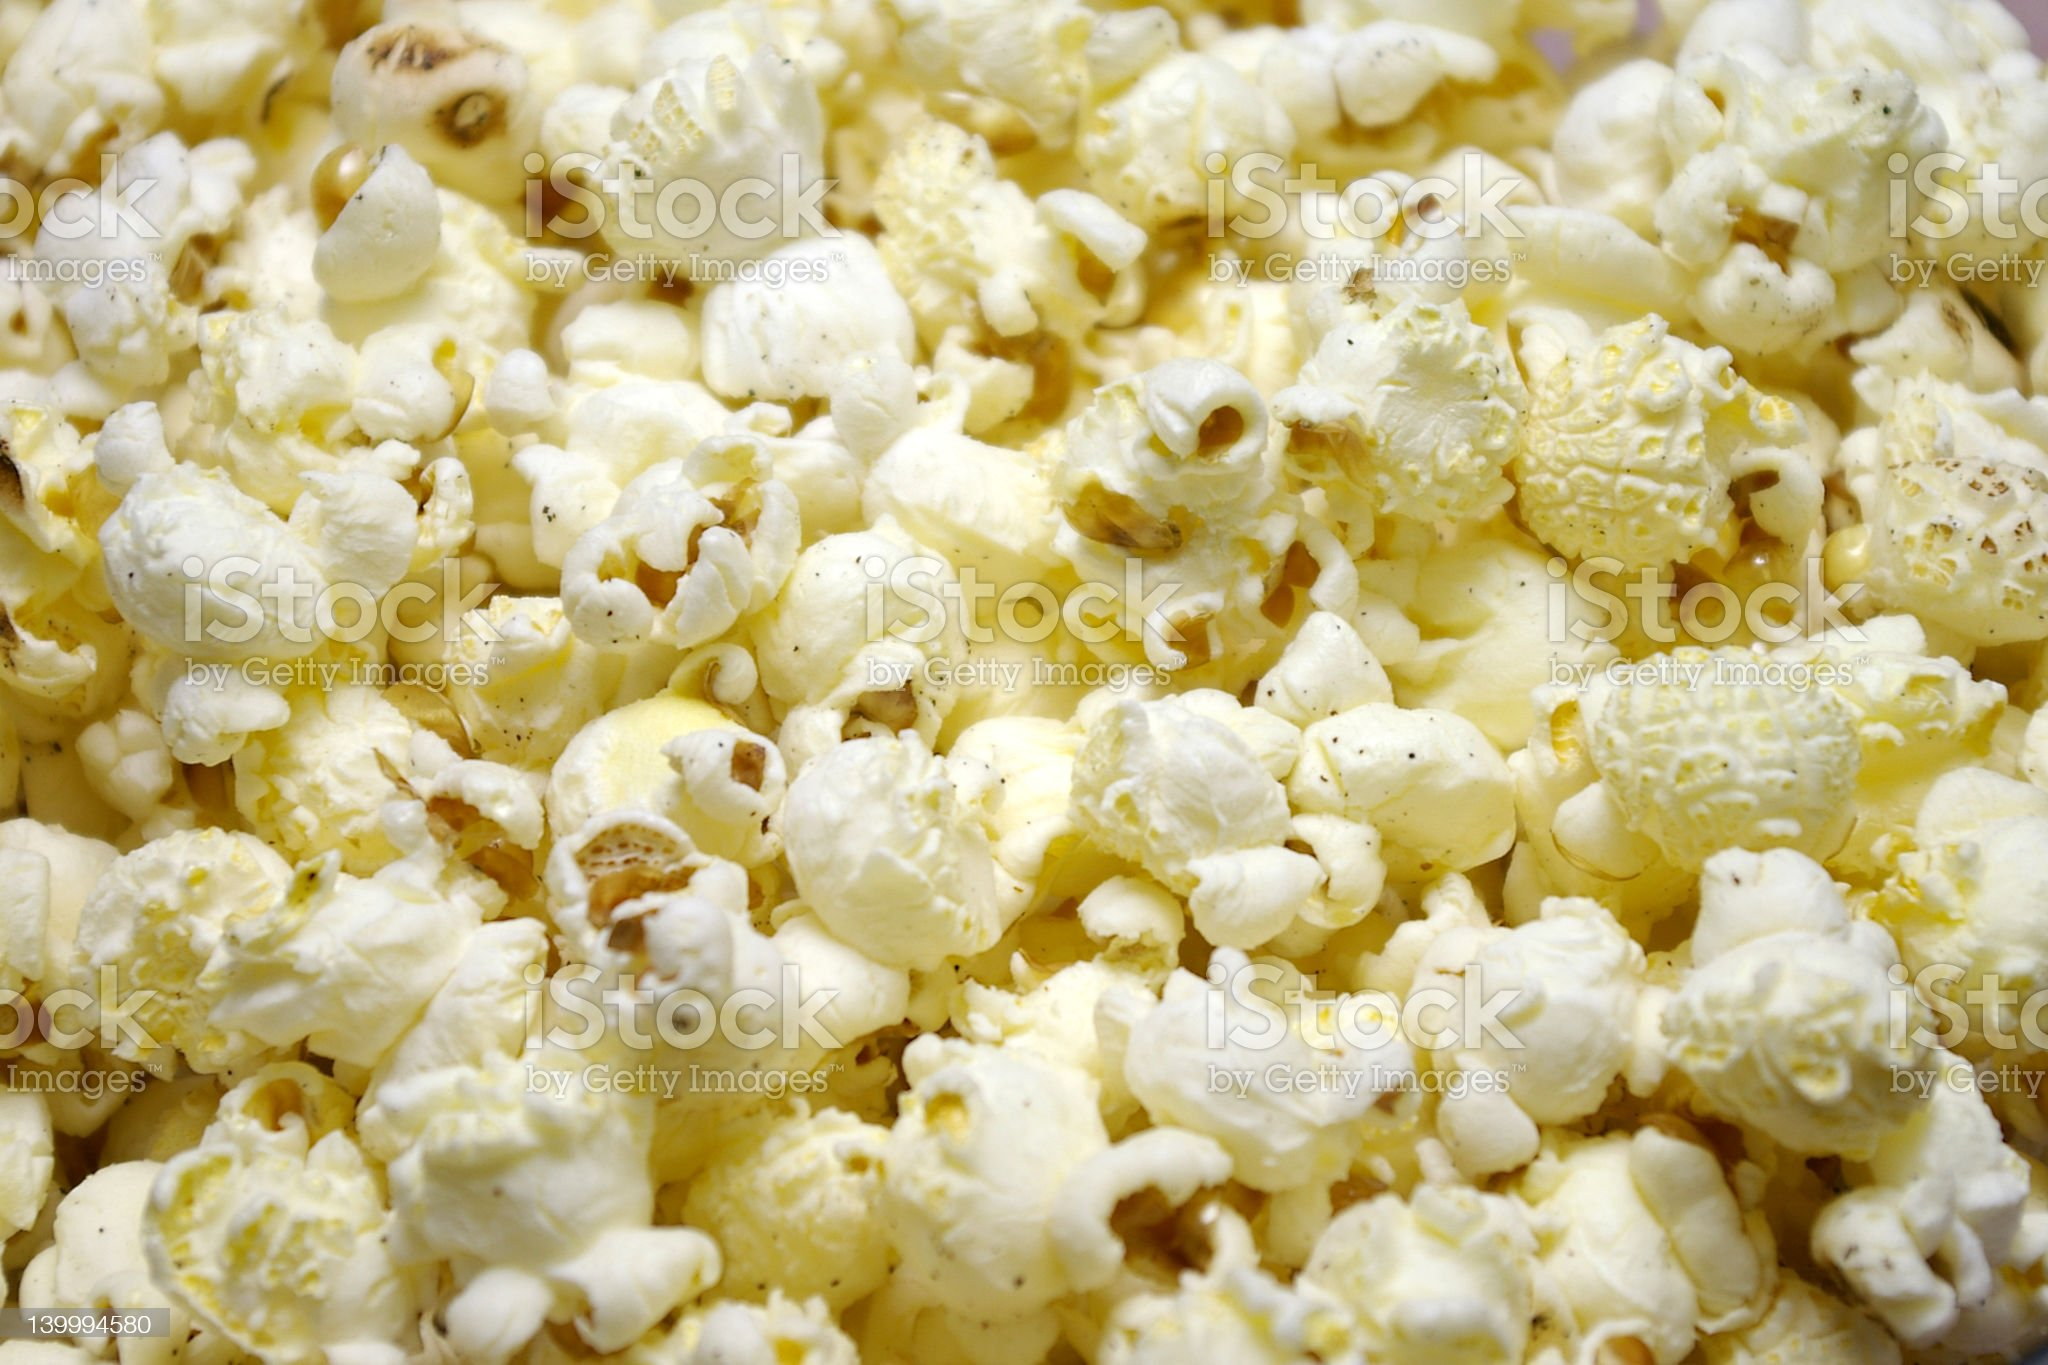 Popcorn Closeup royalty-free stock photo